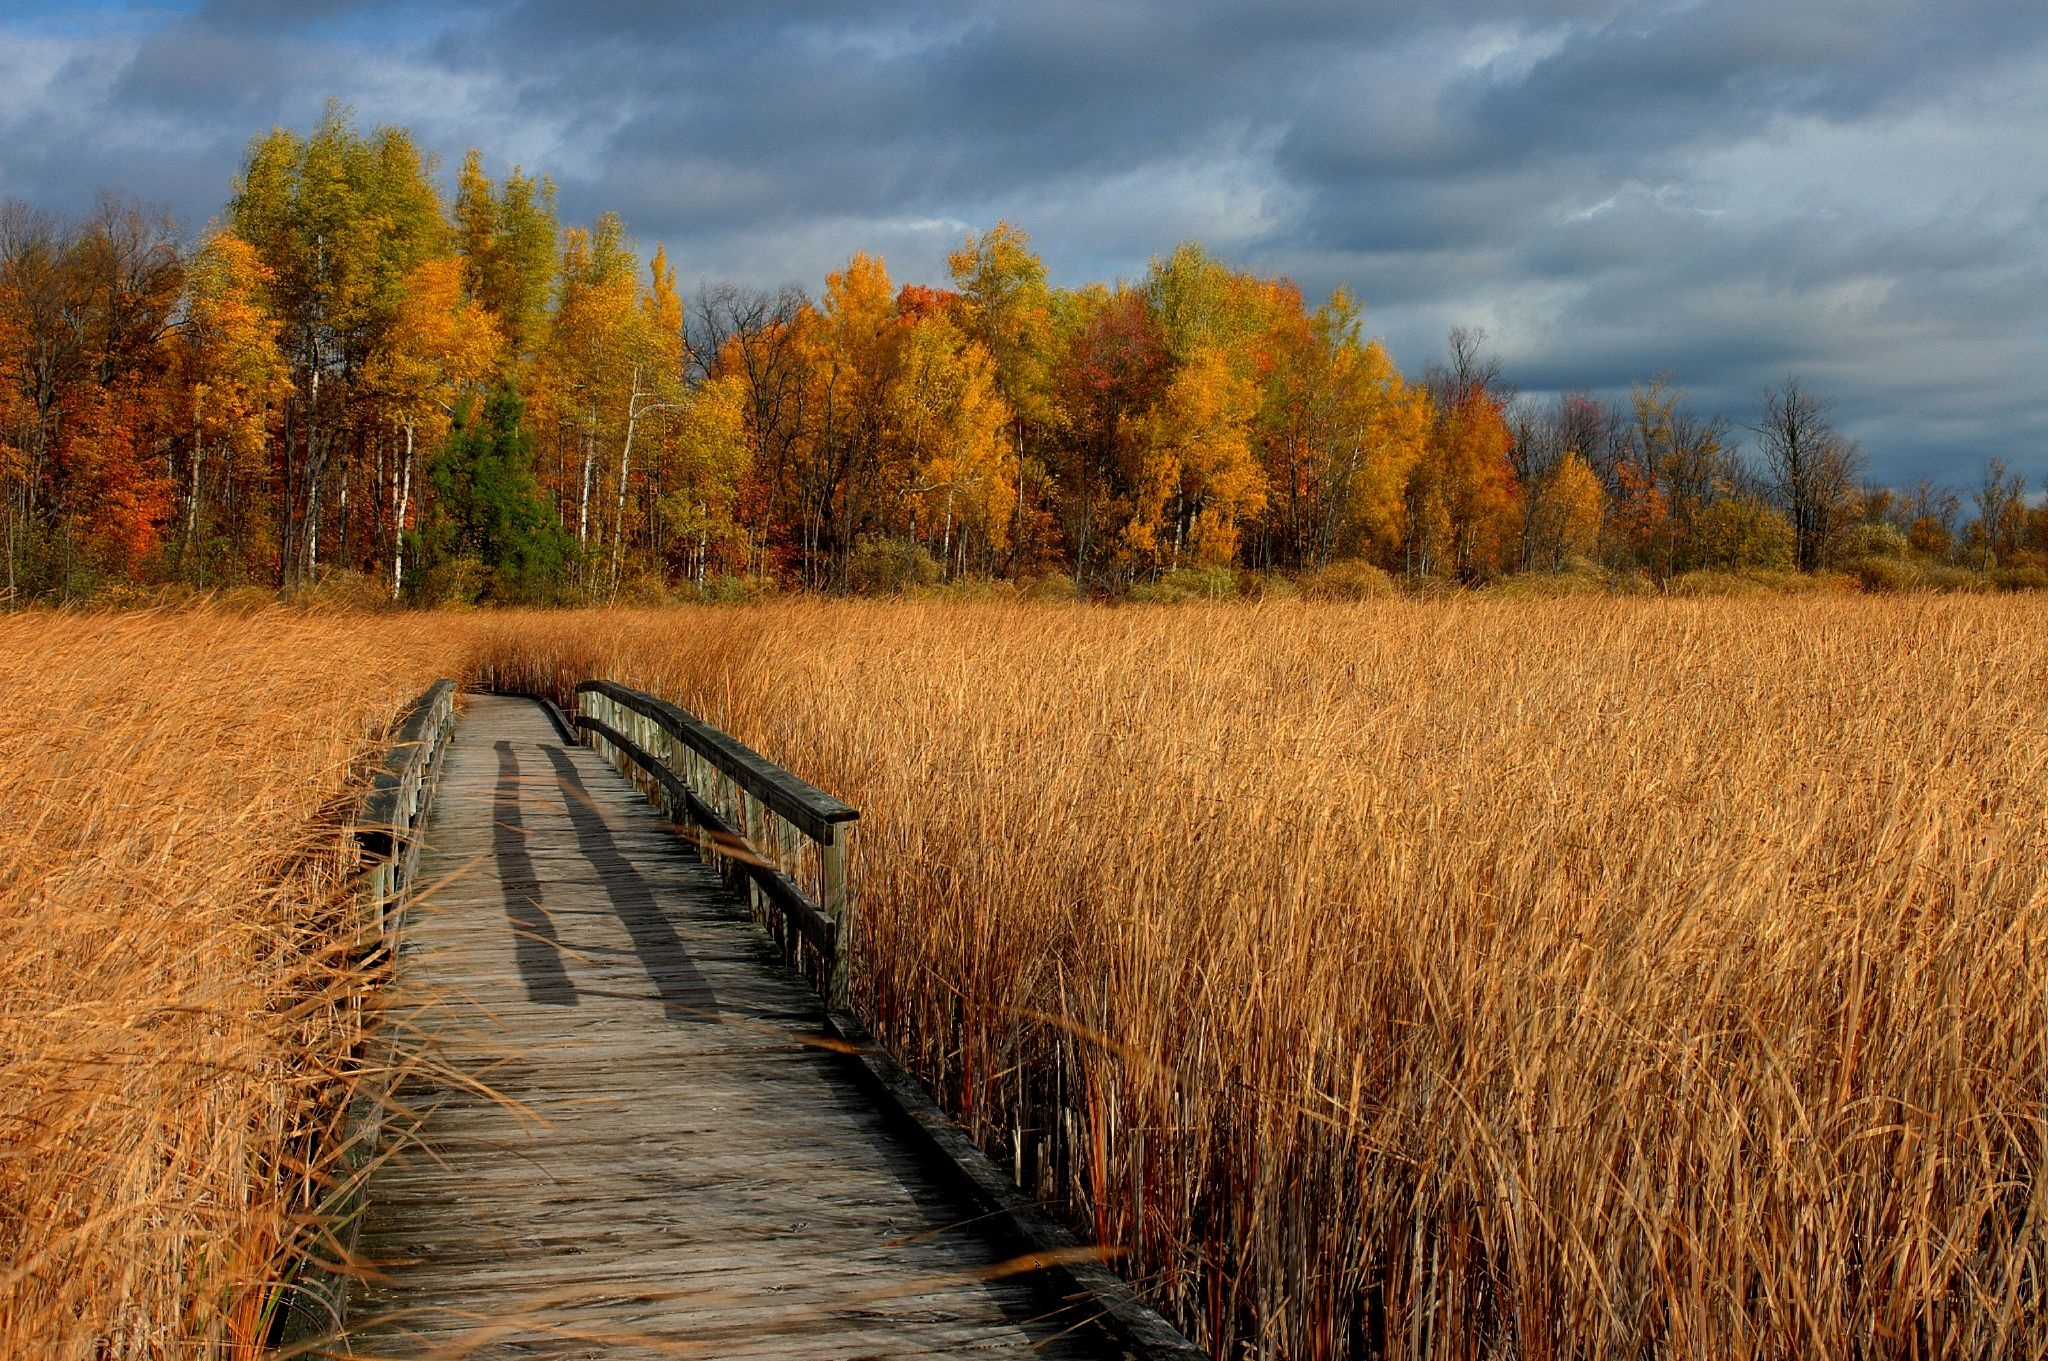 dry grass field background. Autumn Dry Grass Bridge Trees Landscape Wallpaper 2048x1361 Field Background A